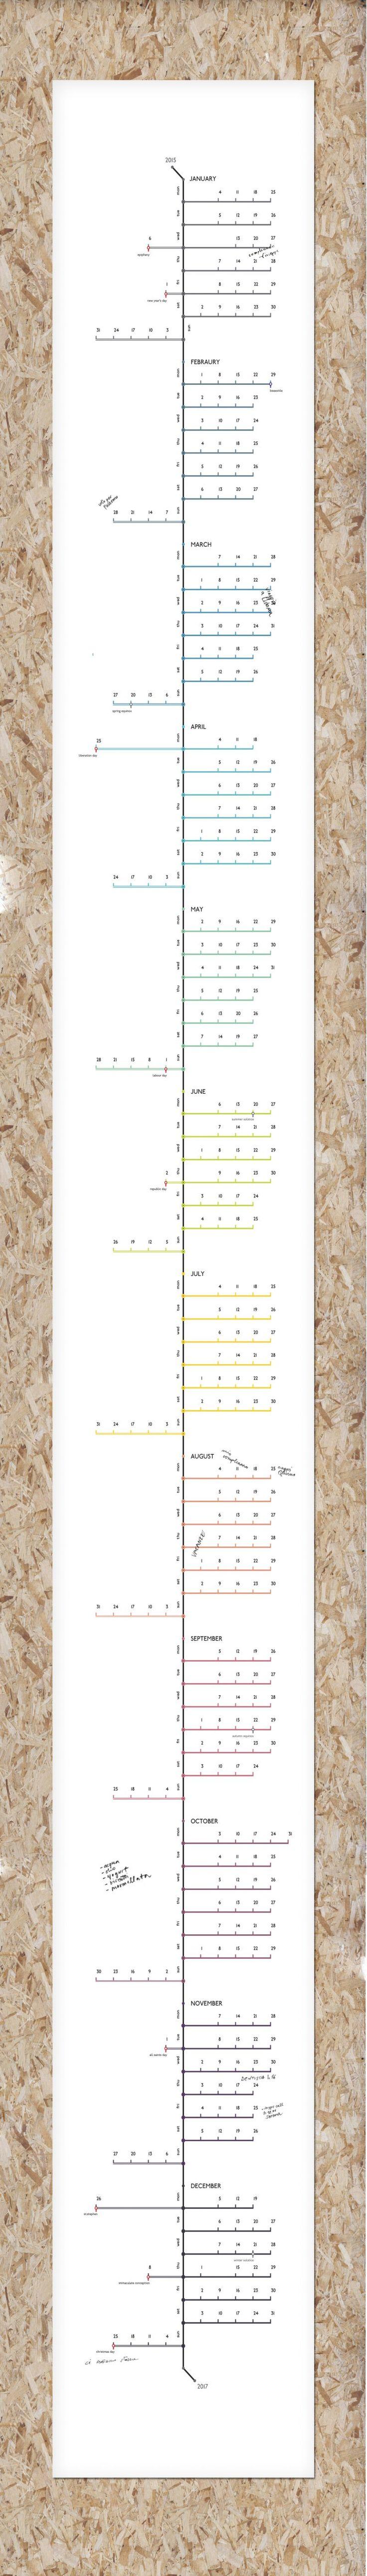 graphic design for walebe wall calendar  |  animalform ∼ design studio